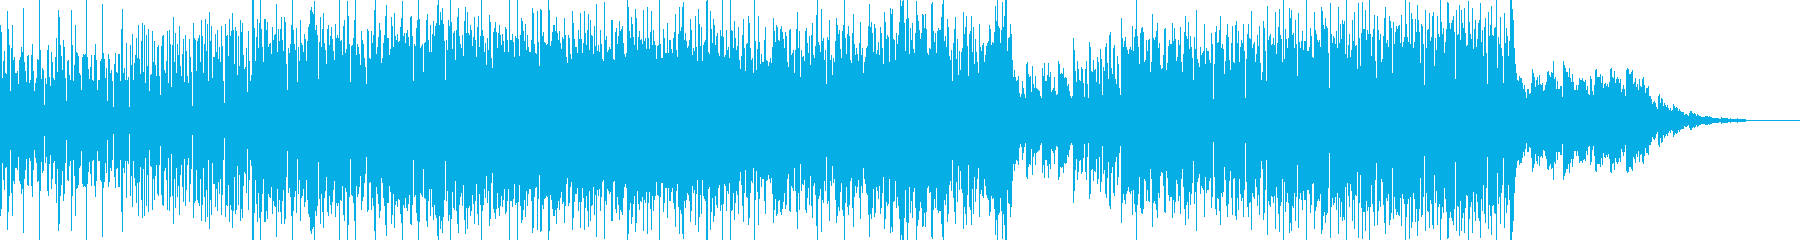 future bass風ポップの曲の再生済みの波形